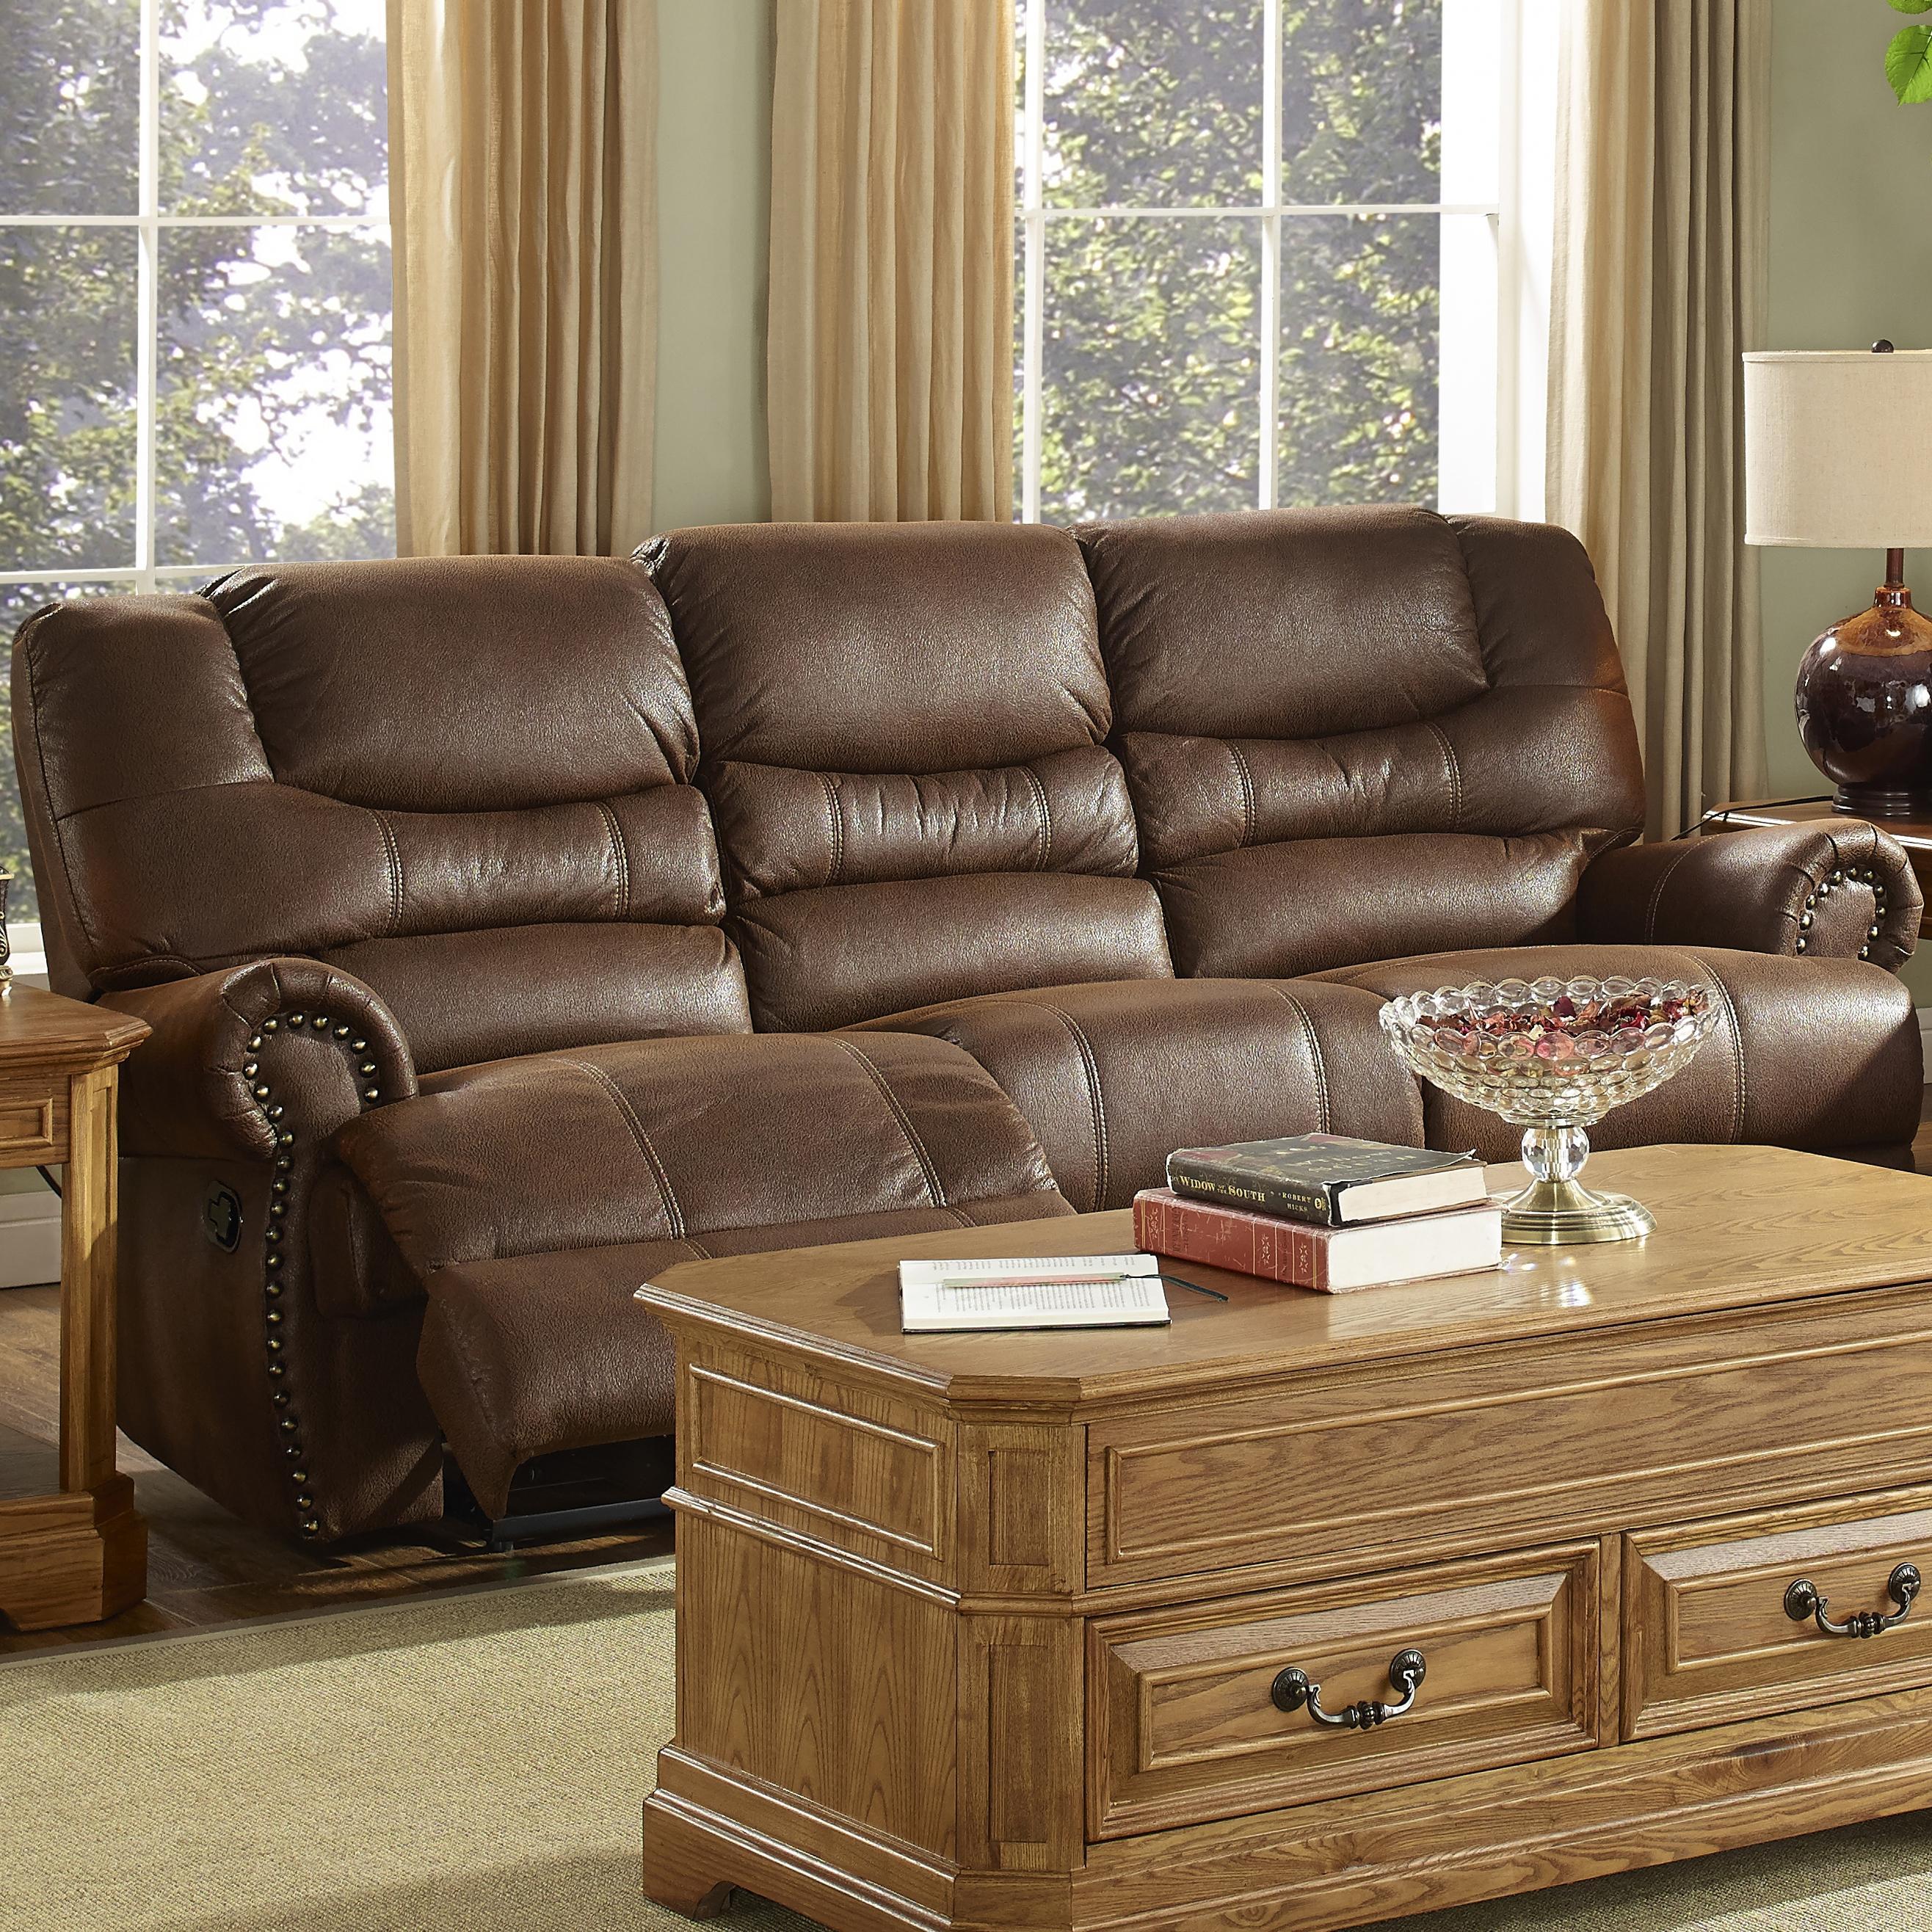 New Classic LaredoTraditional Dual Reclining Sofa